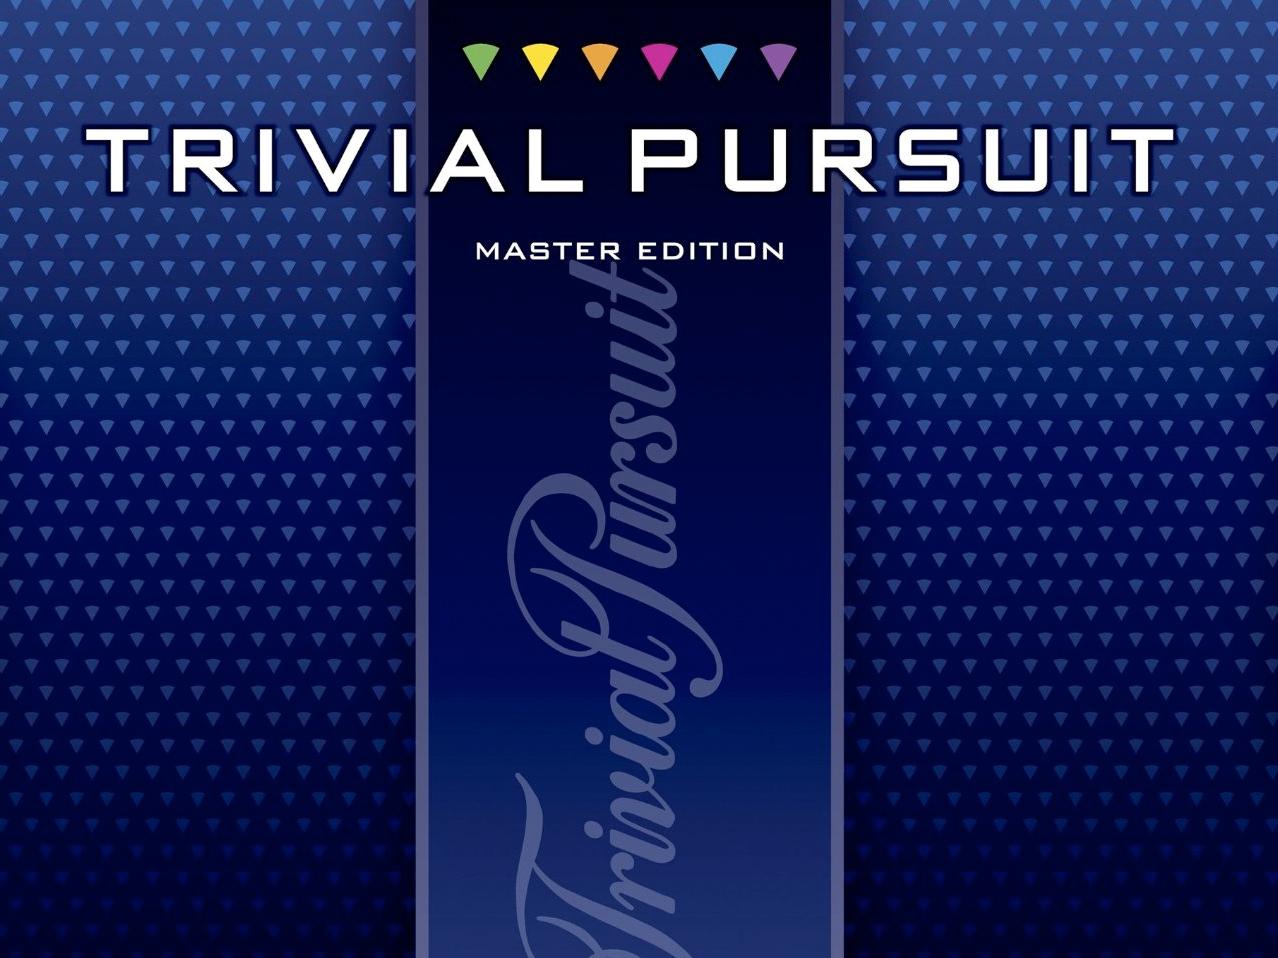 Trivial Pursuit Anleitung